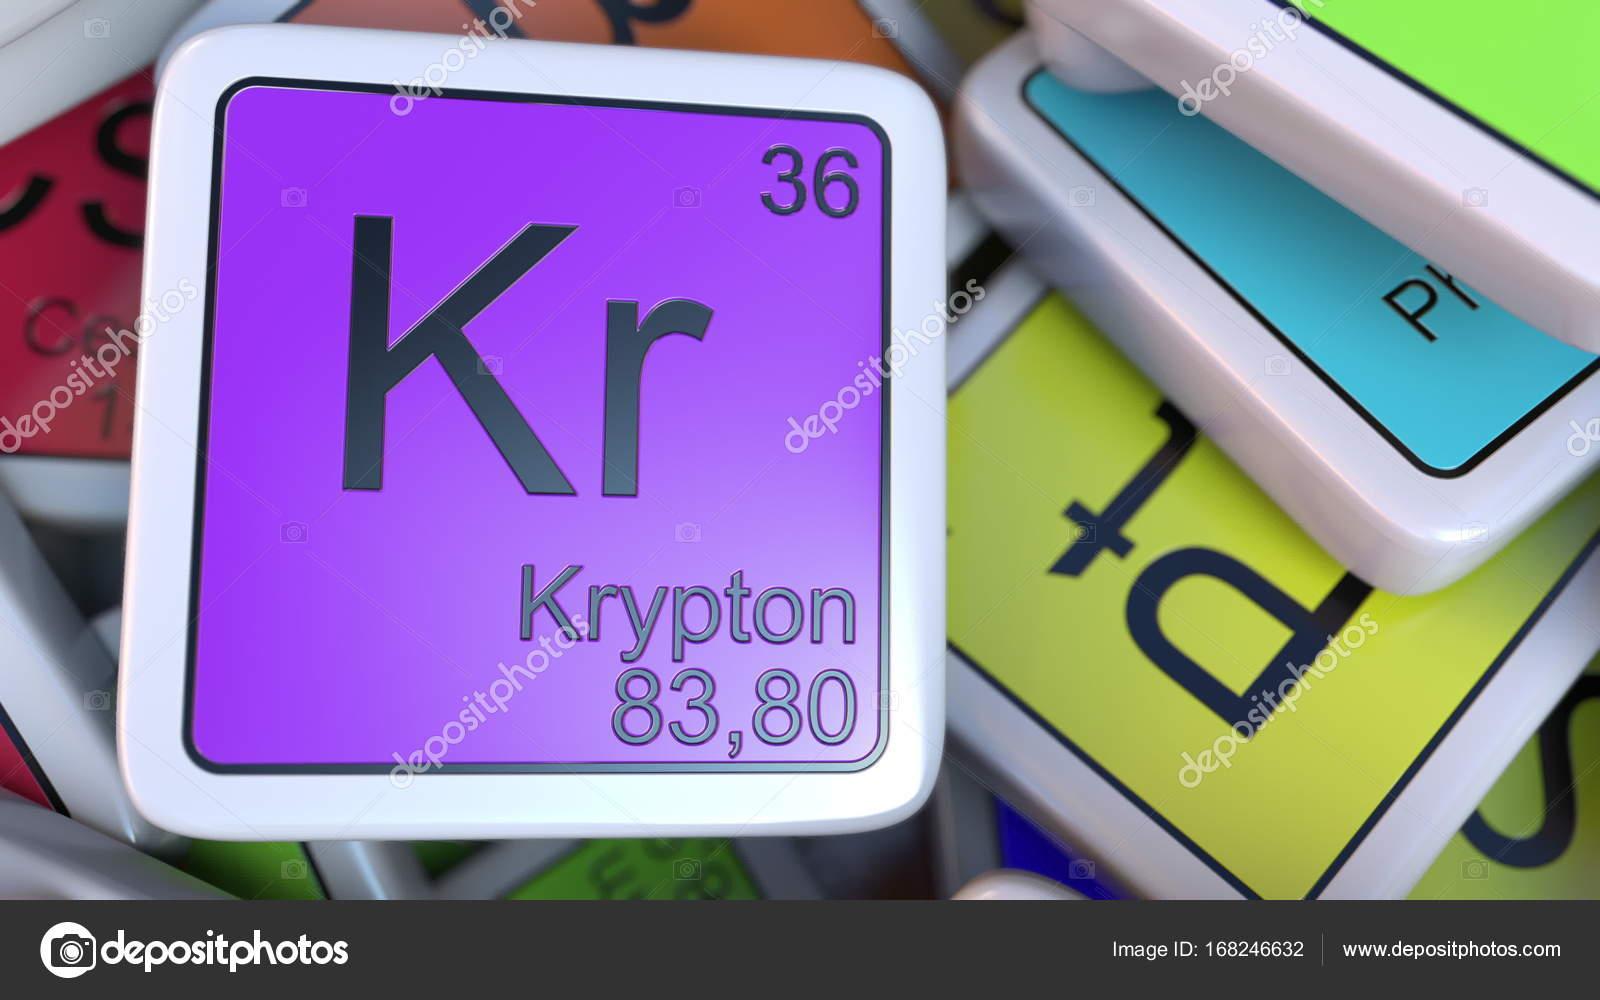 Bloque de kr kriptn en la pila de la tabla peridica de los bloques bloque de kr kriptn en la pila de la tabla peridica de los bloques de elementos urtaz Image collections